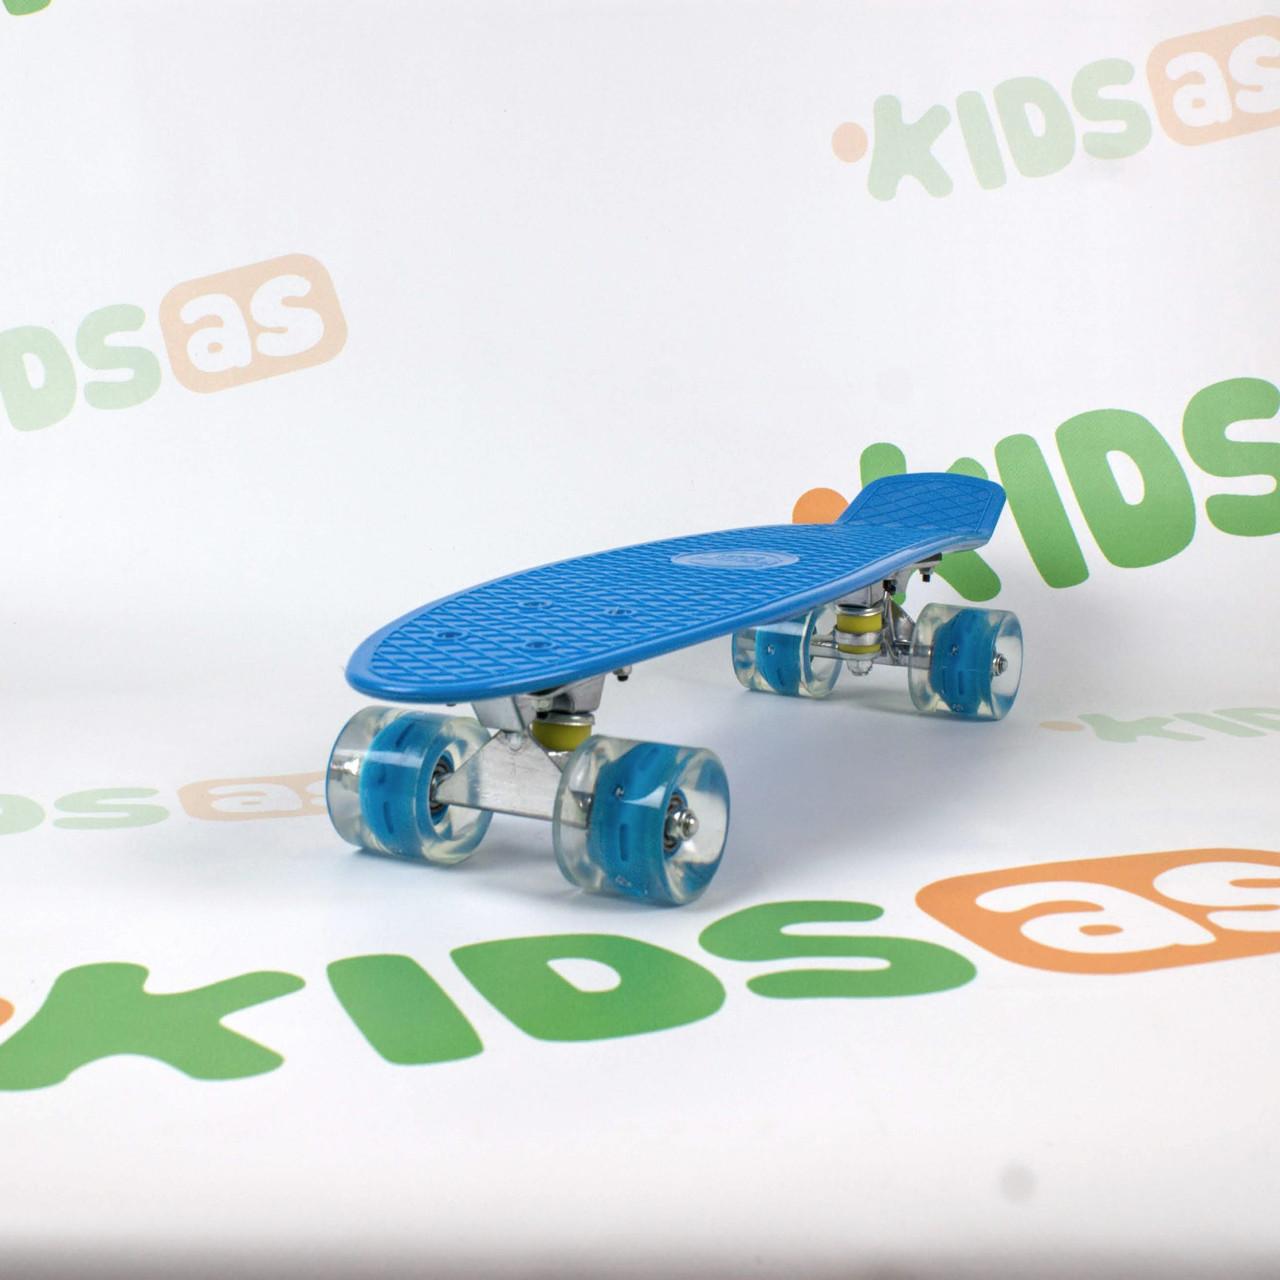 Скейт MS 0848-5 Darck Blue Penny Board свет колес